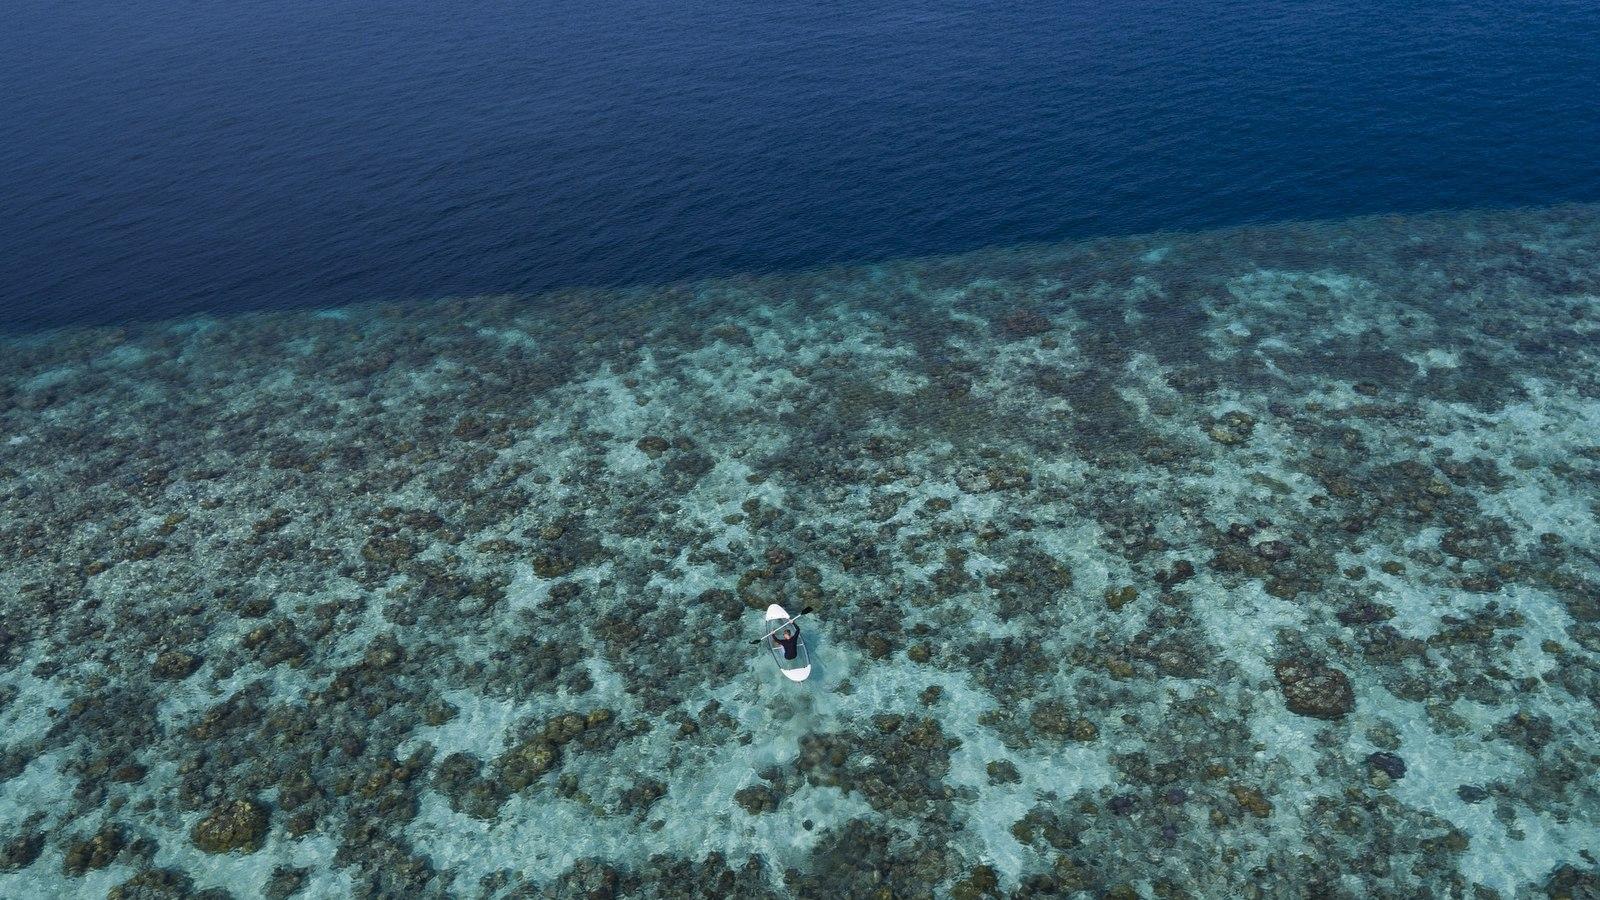 Мальдивы, отель Anantara Kihavah Maldives Villas, домашний риф